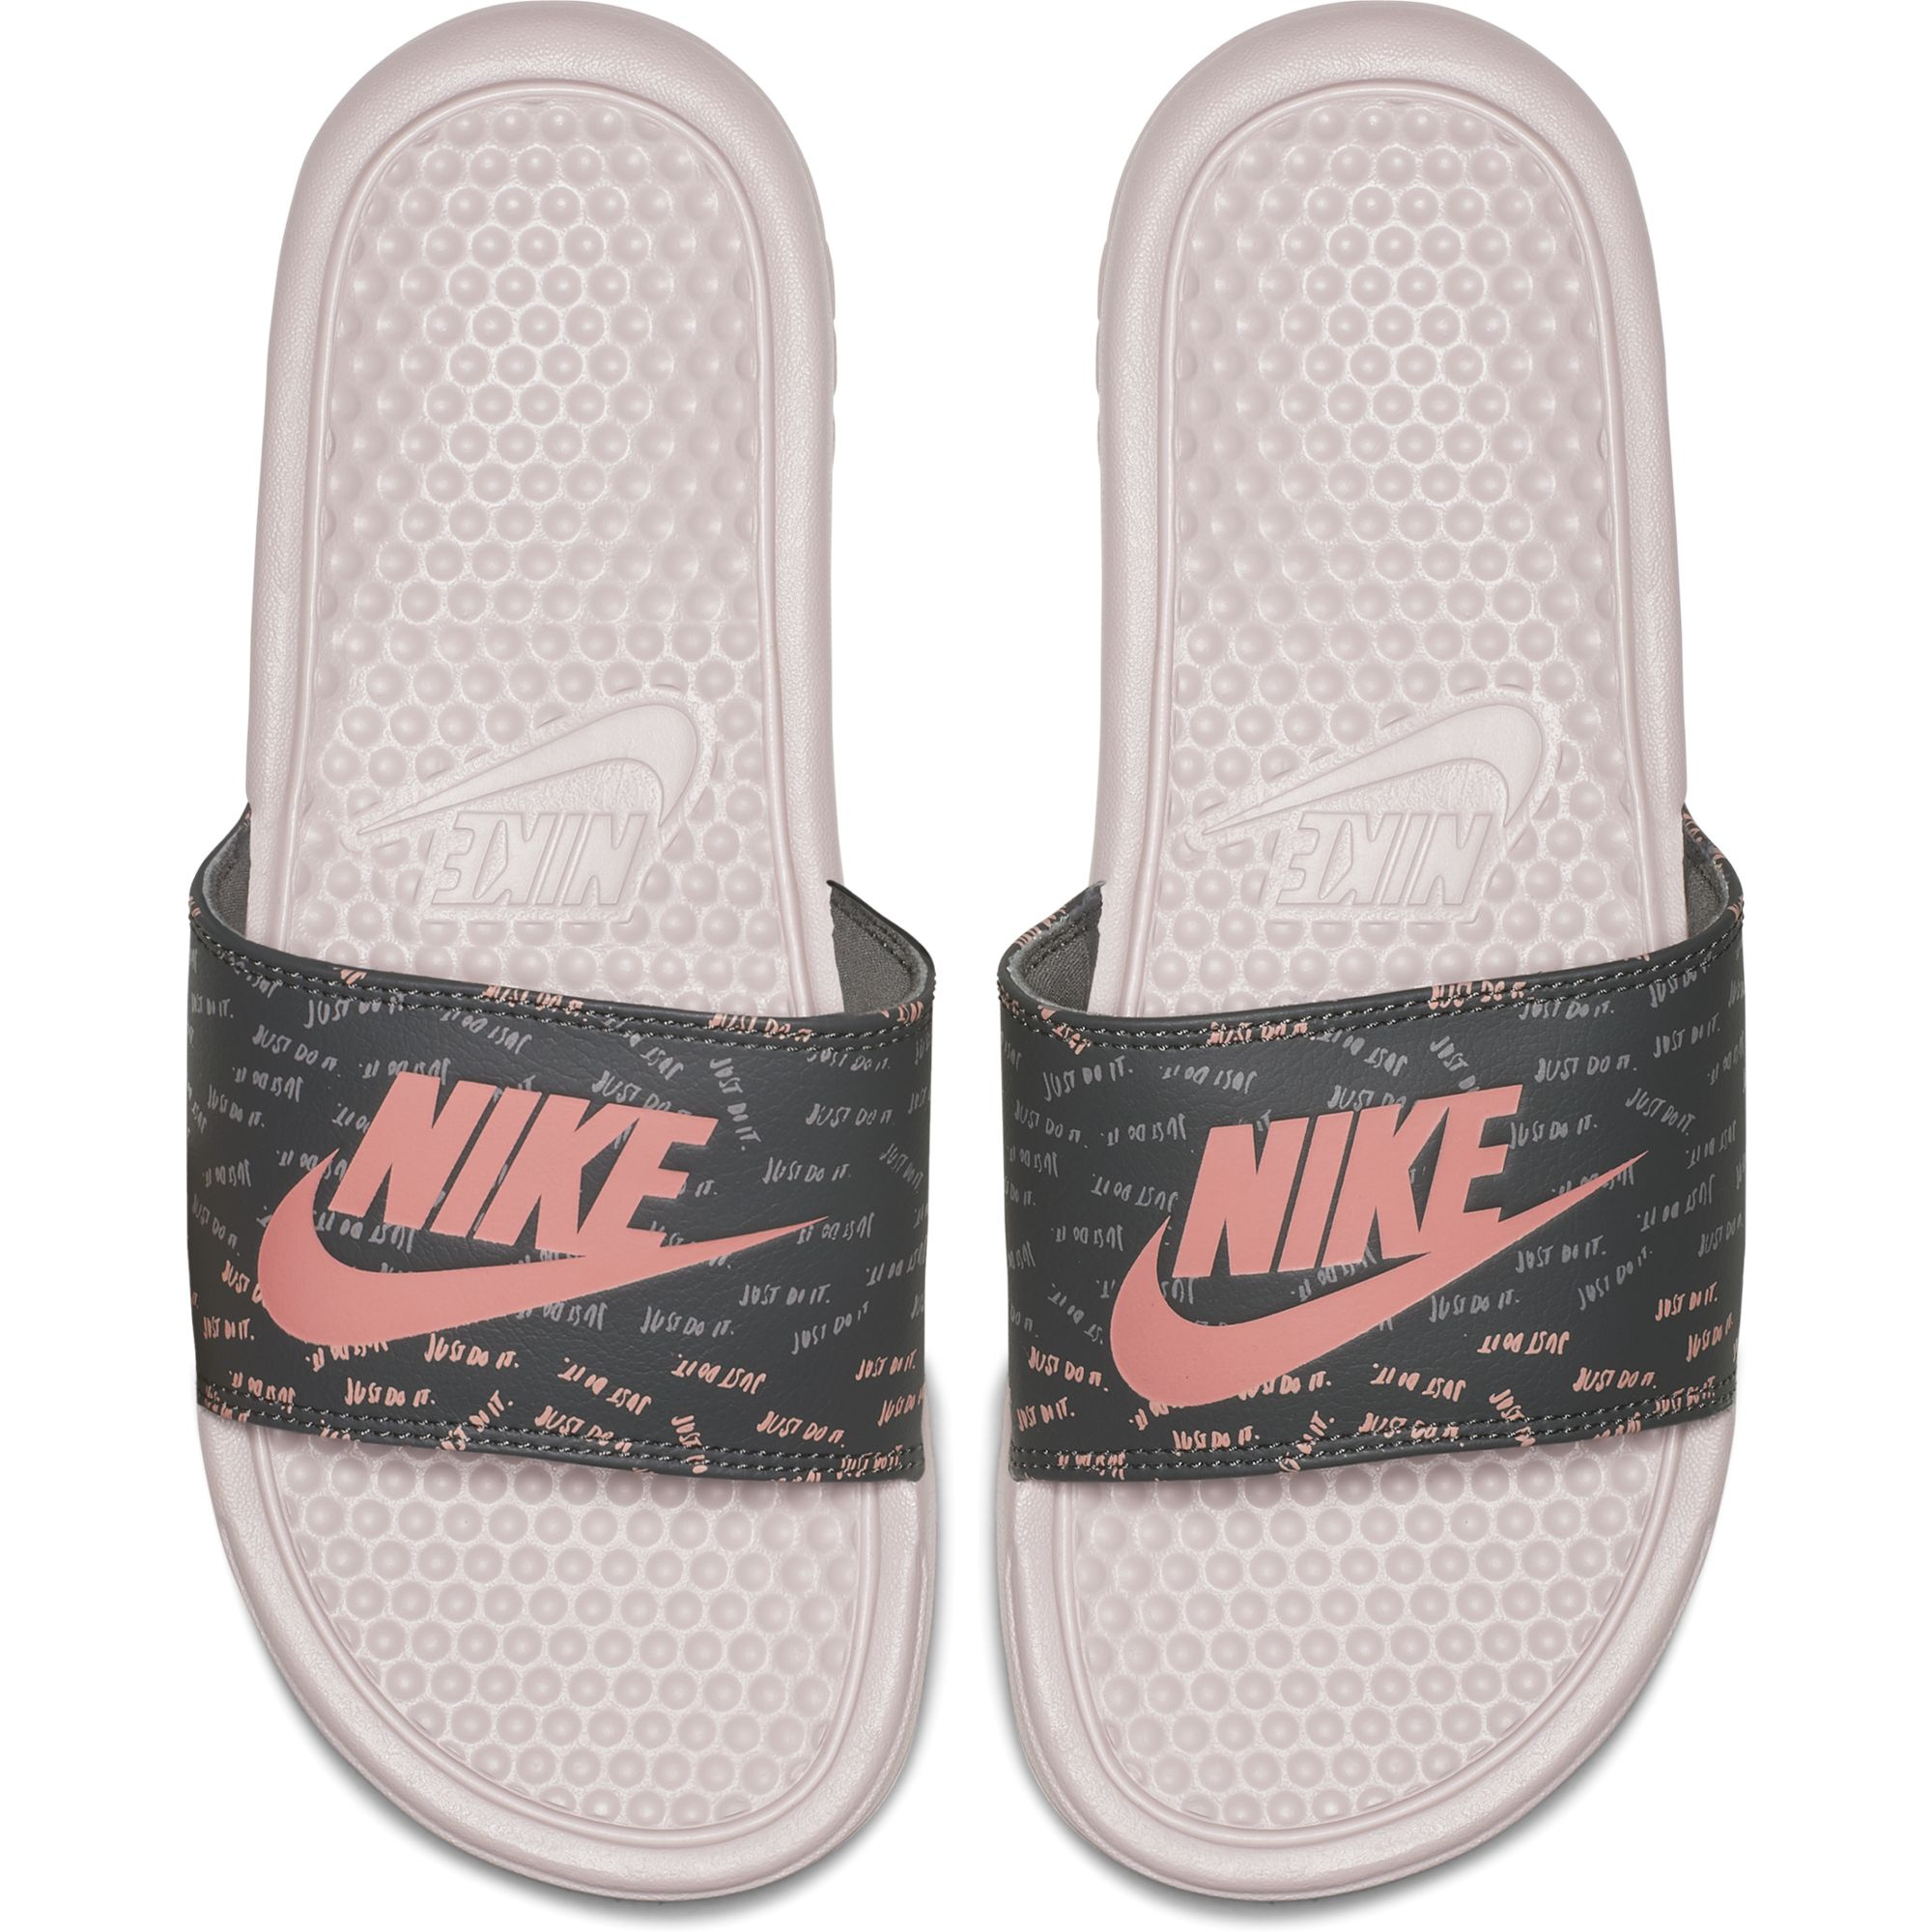 582eb3f924 Nike Pantofle Benassi Just Do It 618919605 - Glami.cz